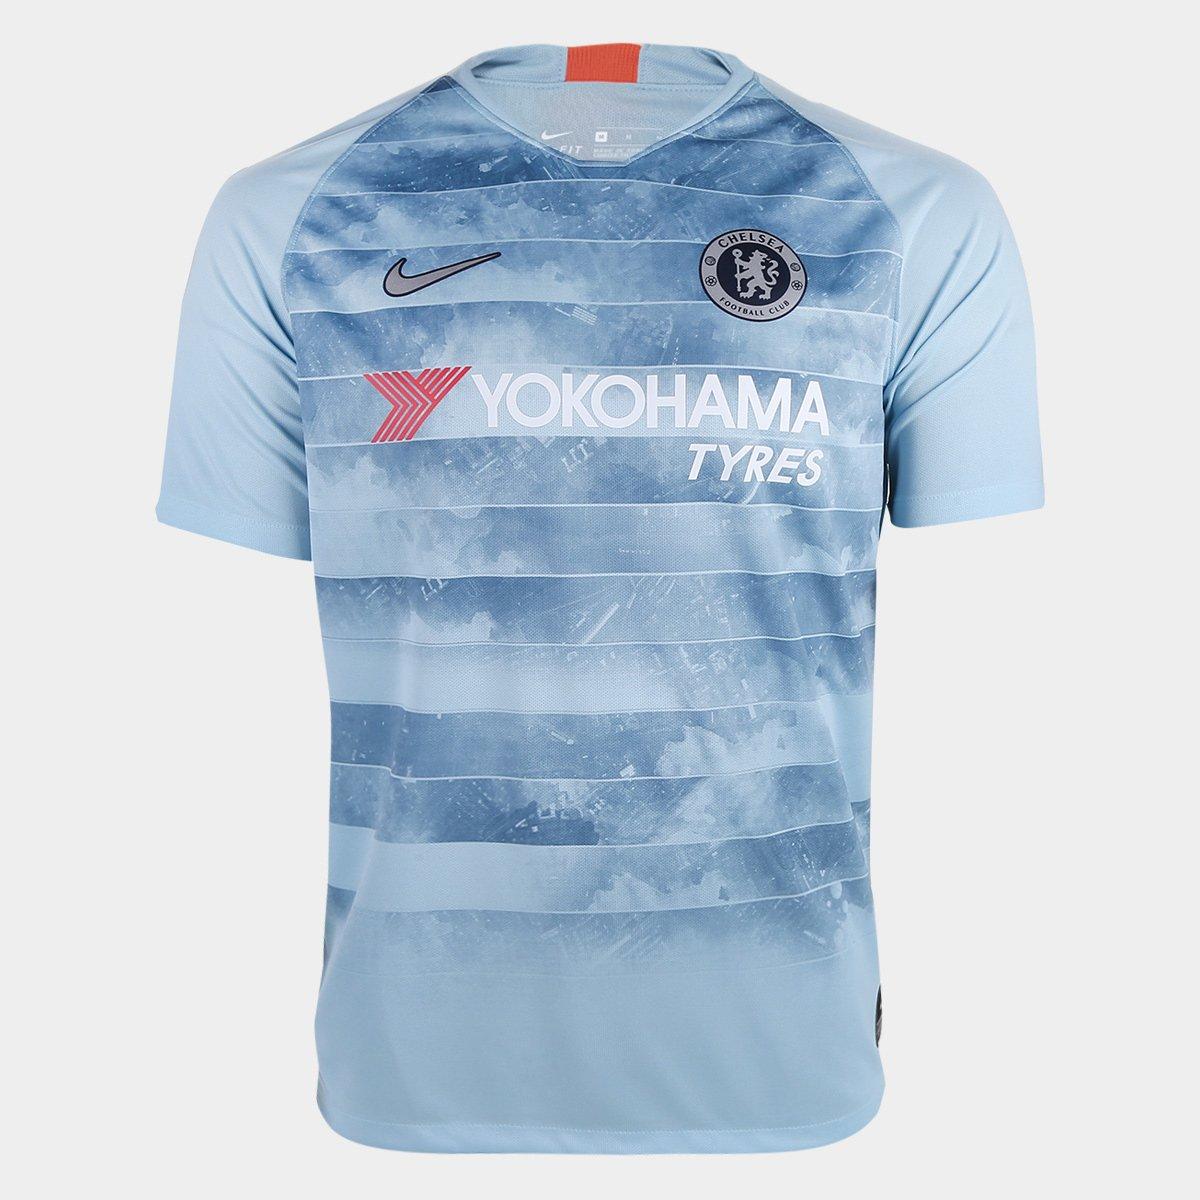 811f1305dbf0e Camisa Chelsea Third 2018 s n° - Torcedor Nike Masculina - Compre Agora